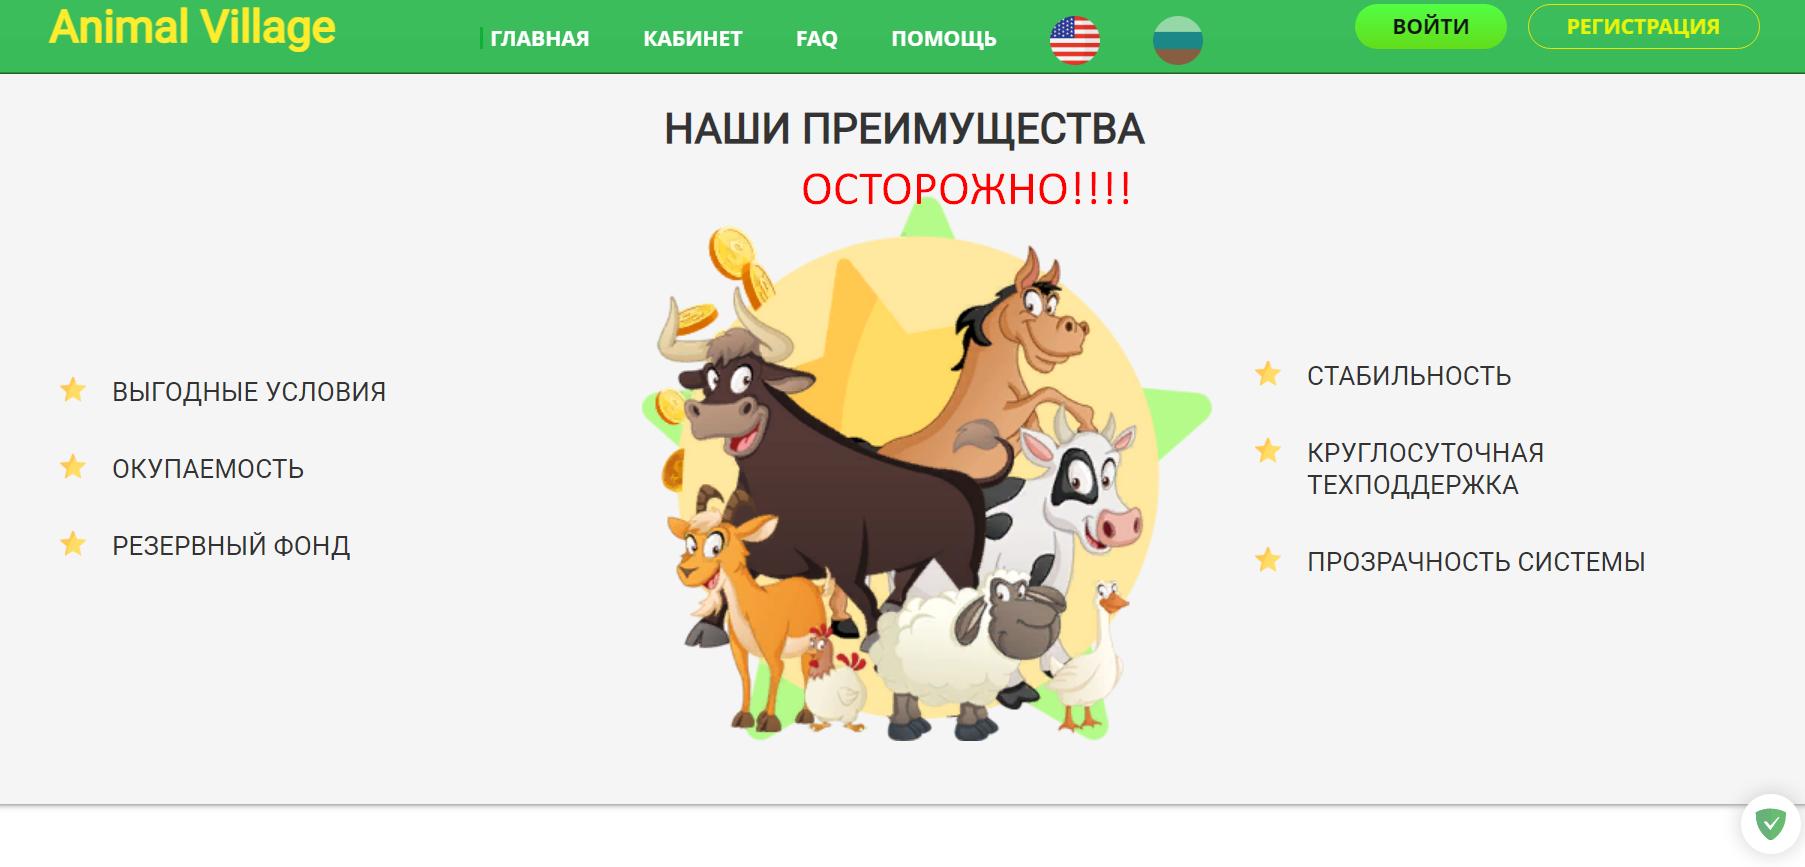 Animal Village обман